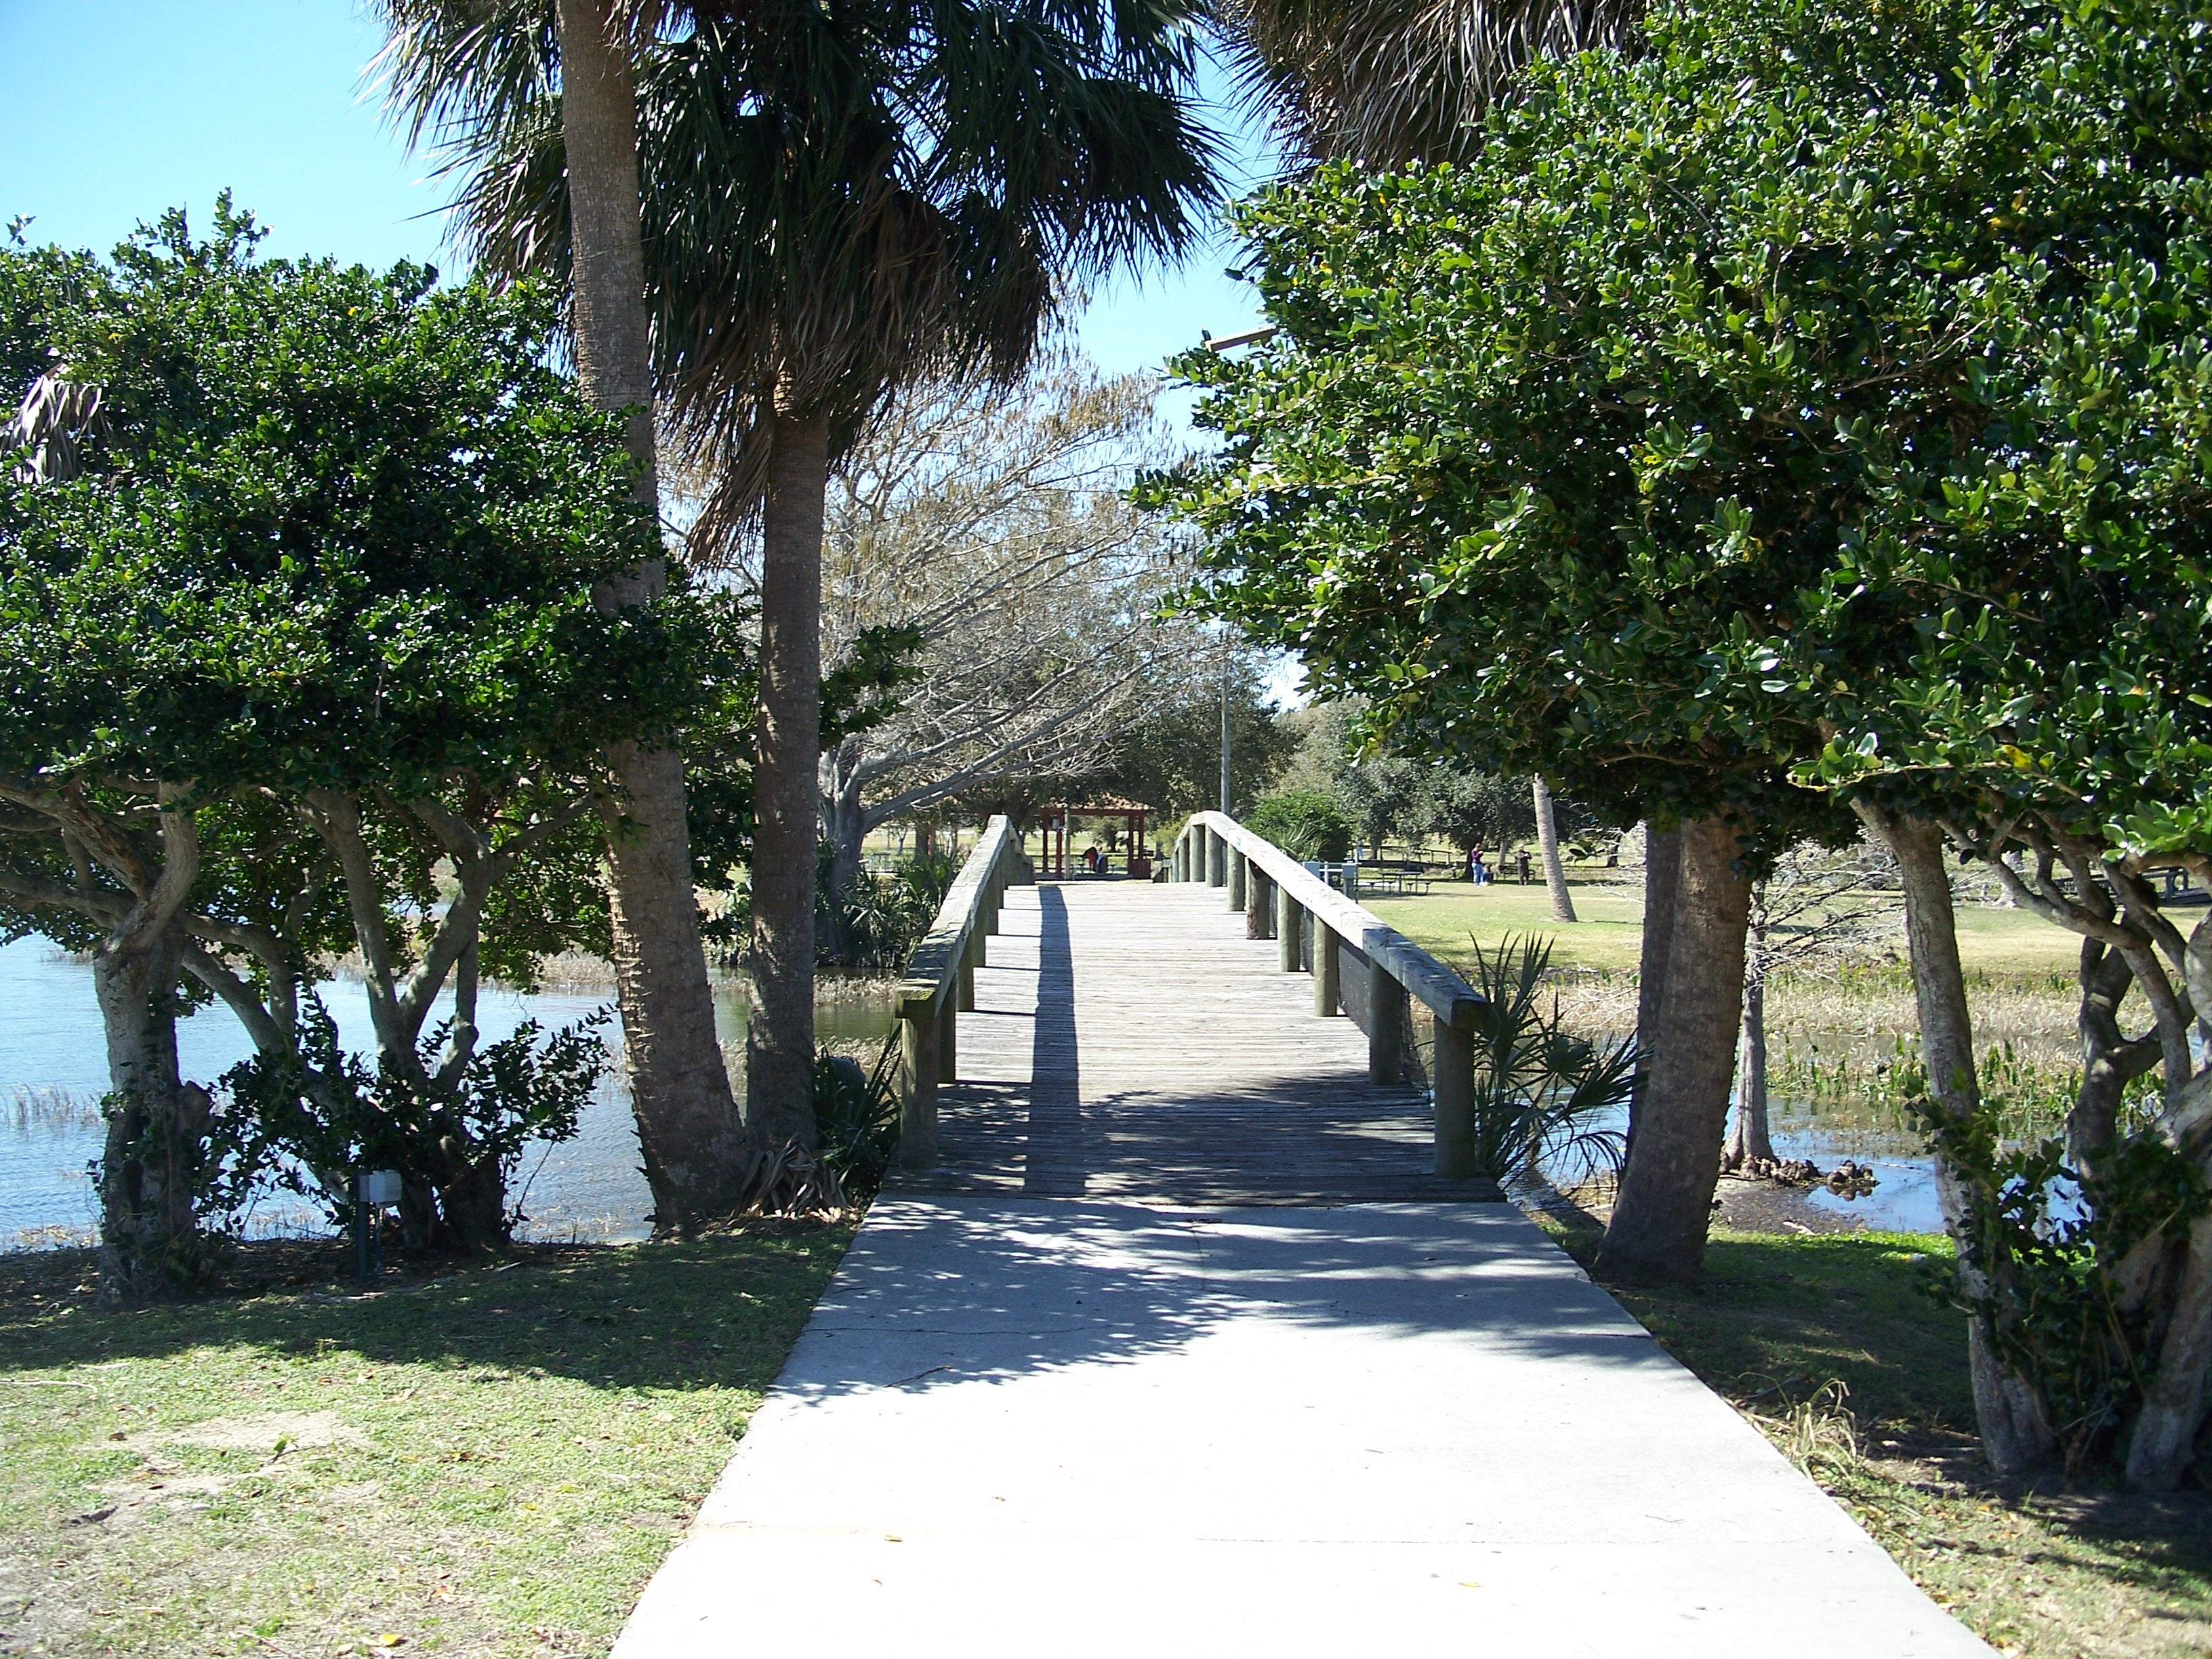 Delightful File:Leesburg FL Venetian Gardens Bridge02